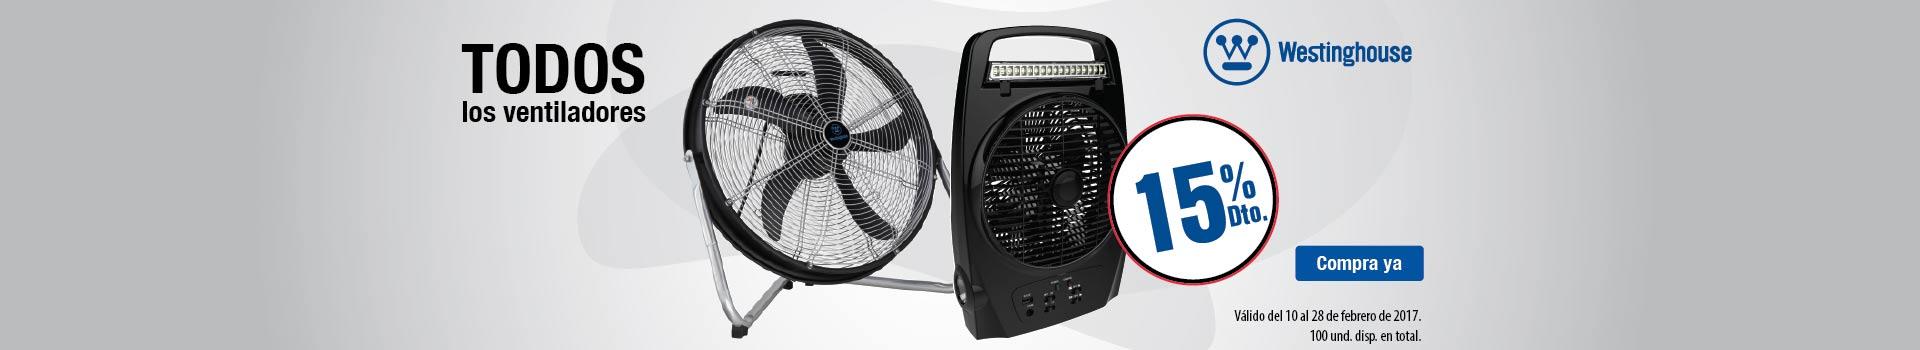 CAT CLIMA - feb 10 - 15%Dto ventiladores WESTINGHOUSE